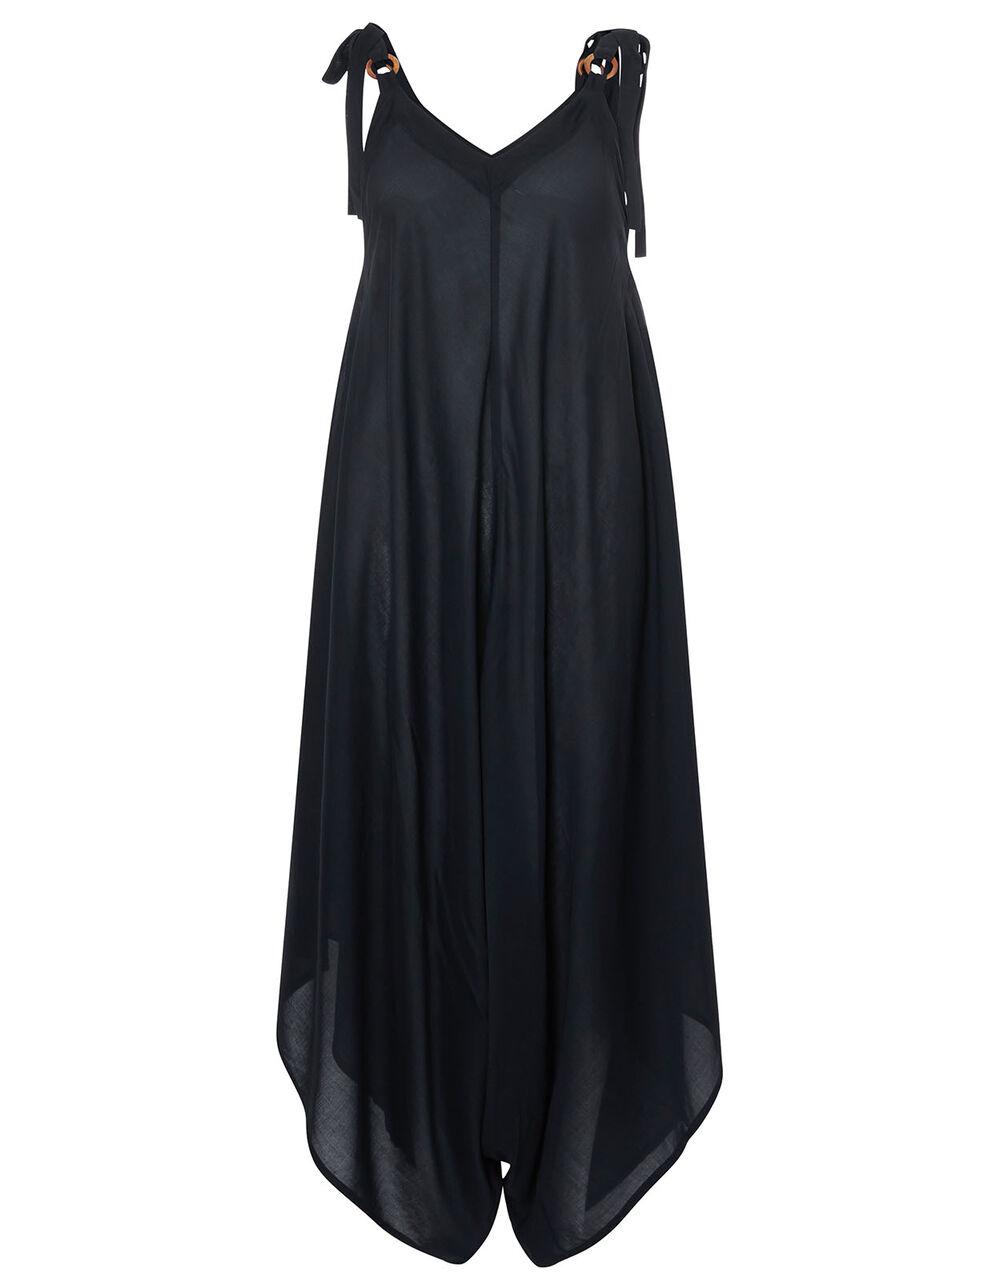 Relaxed Romper in LENZING™ ECOVERO™, Black (BLACK), large